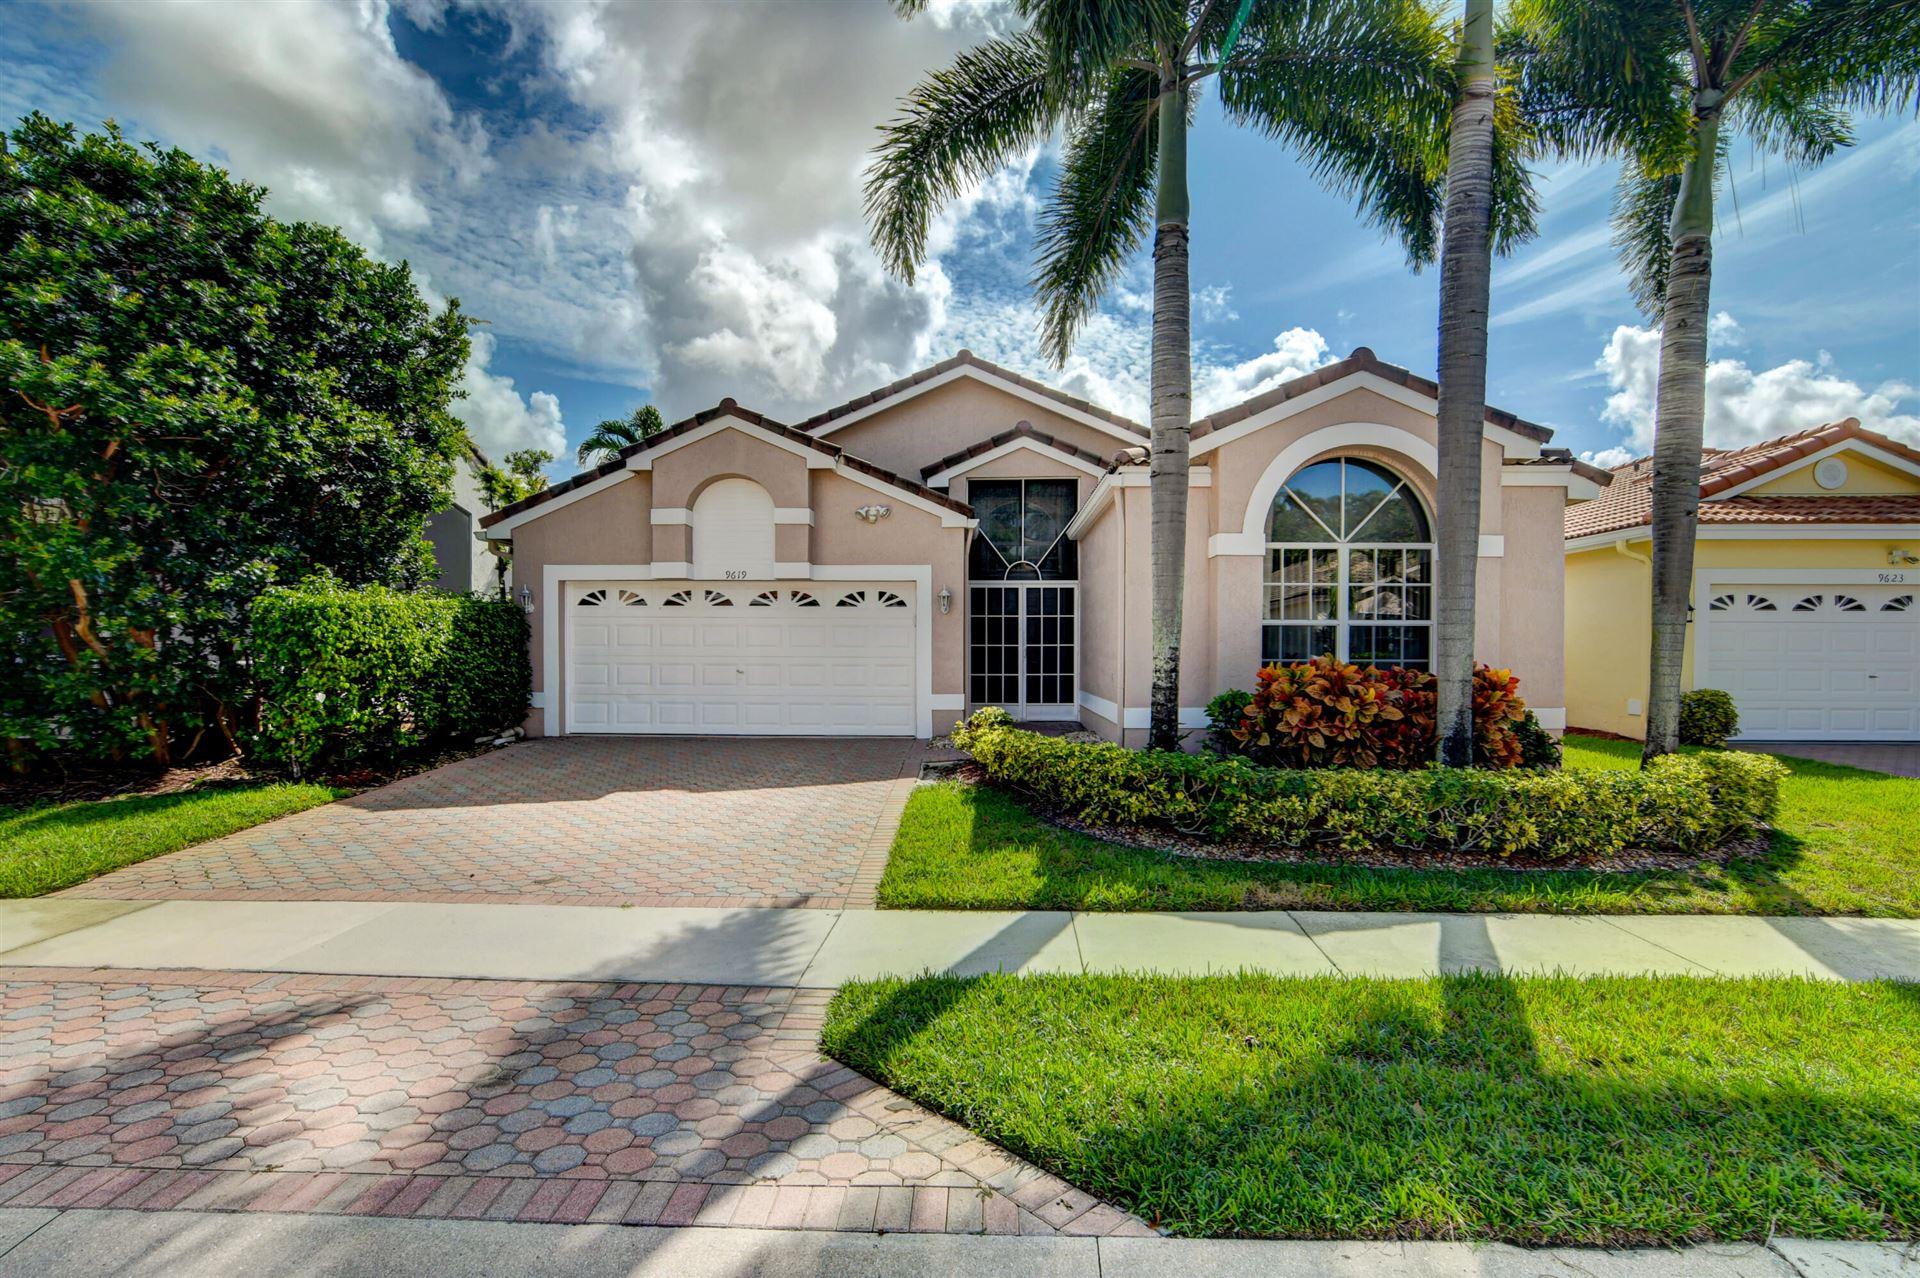 Photo of 9619 Honeybell Circle, Boynton Beach, FL 33437 (MLS # RX-10746238)